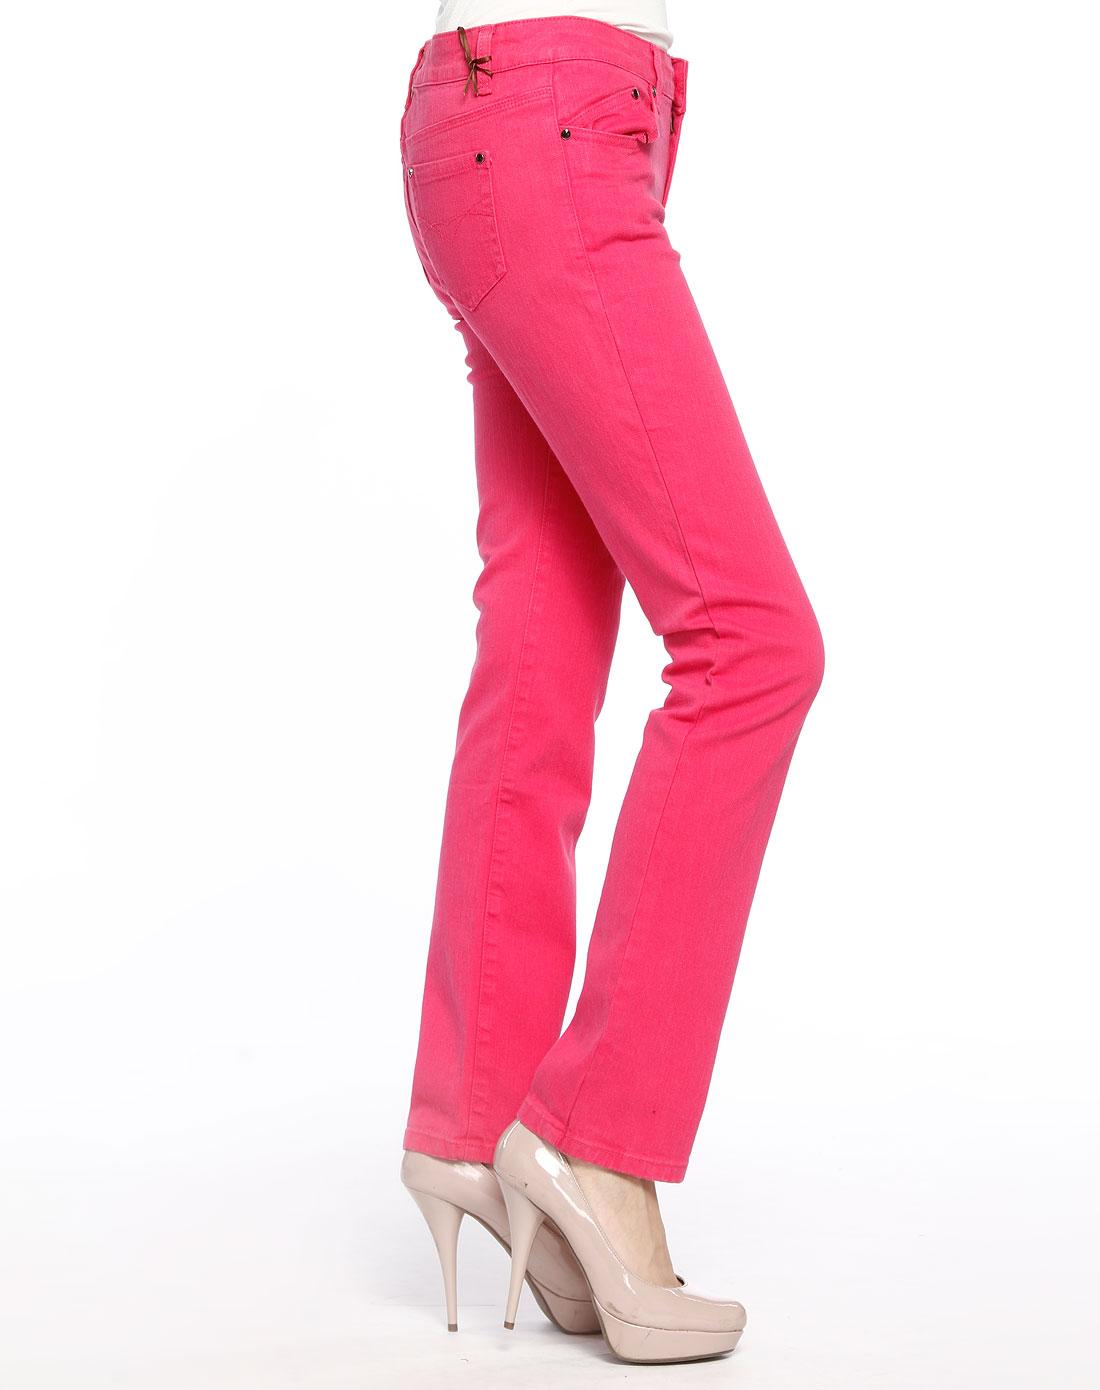 unisex-玫红色弹力竹节小脚长裤